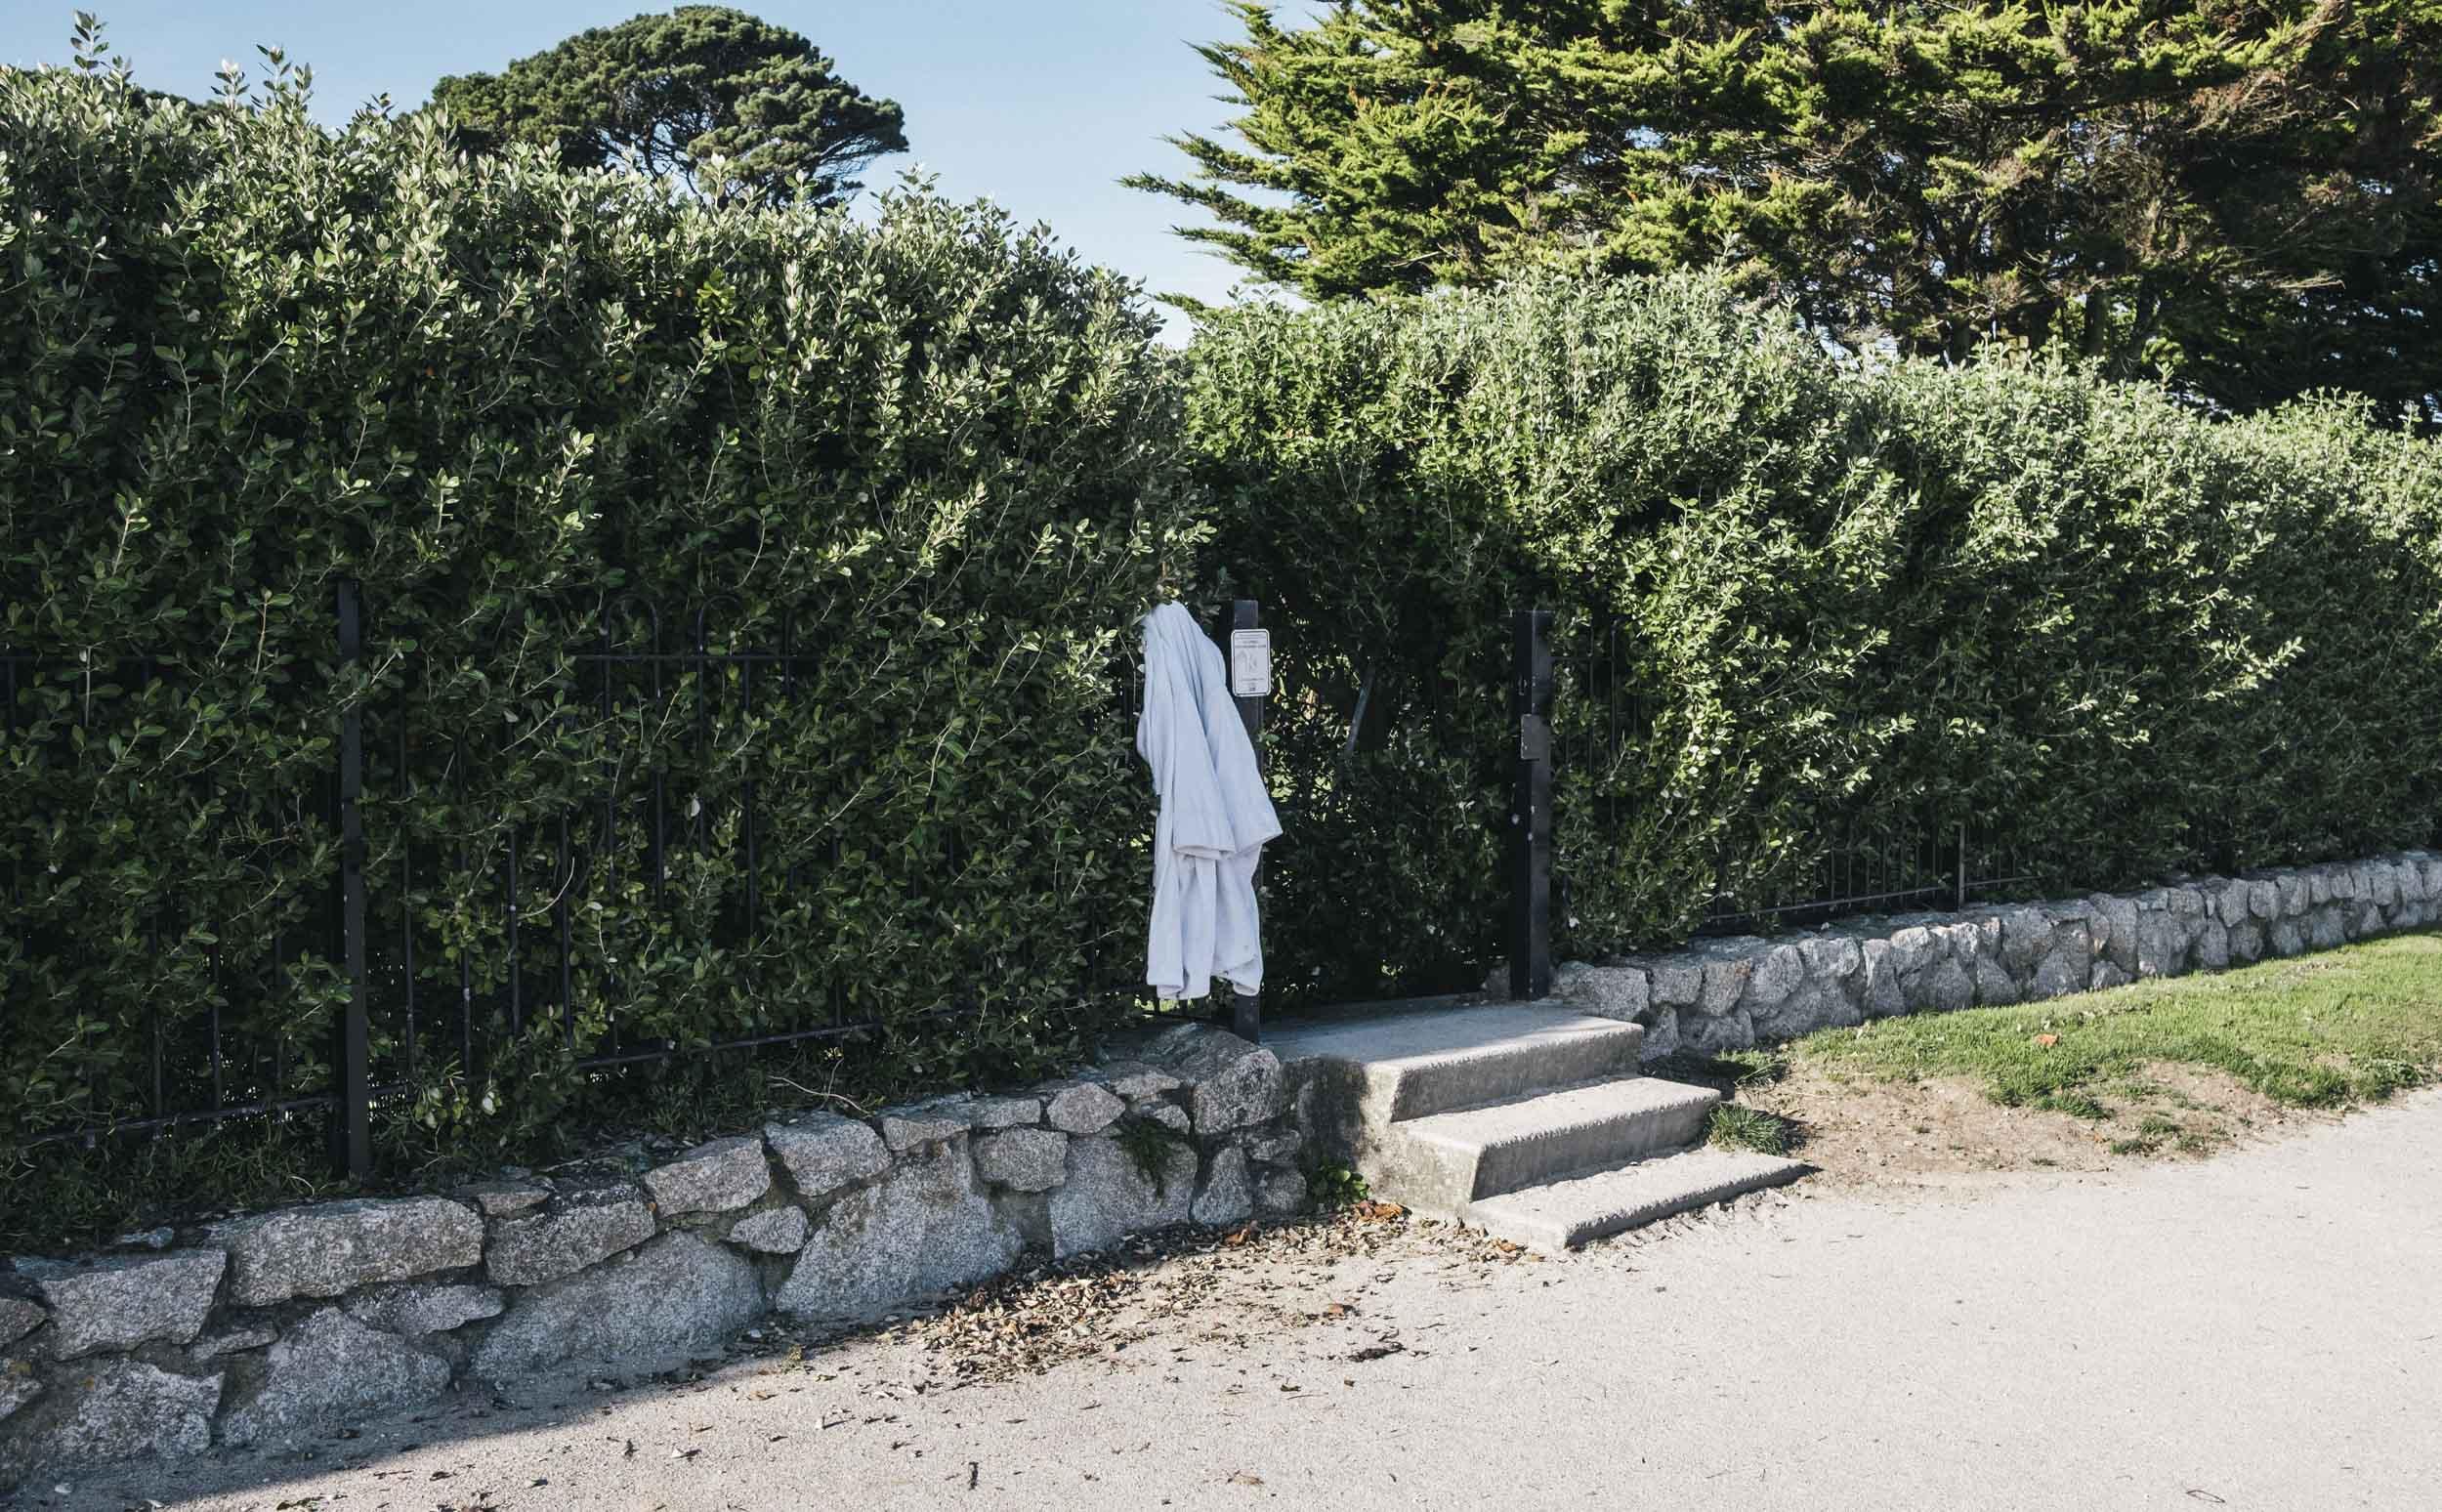 Forgotten robe